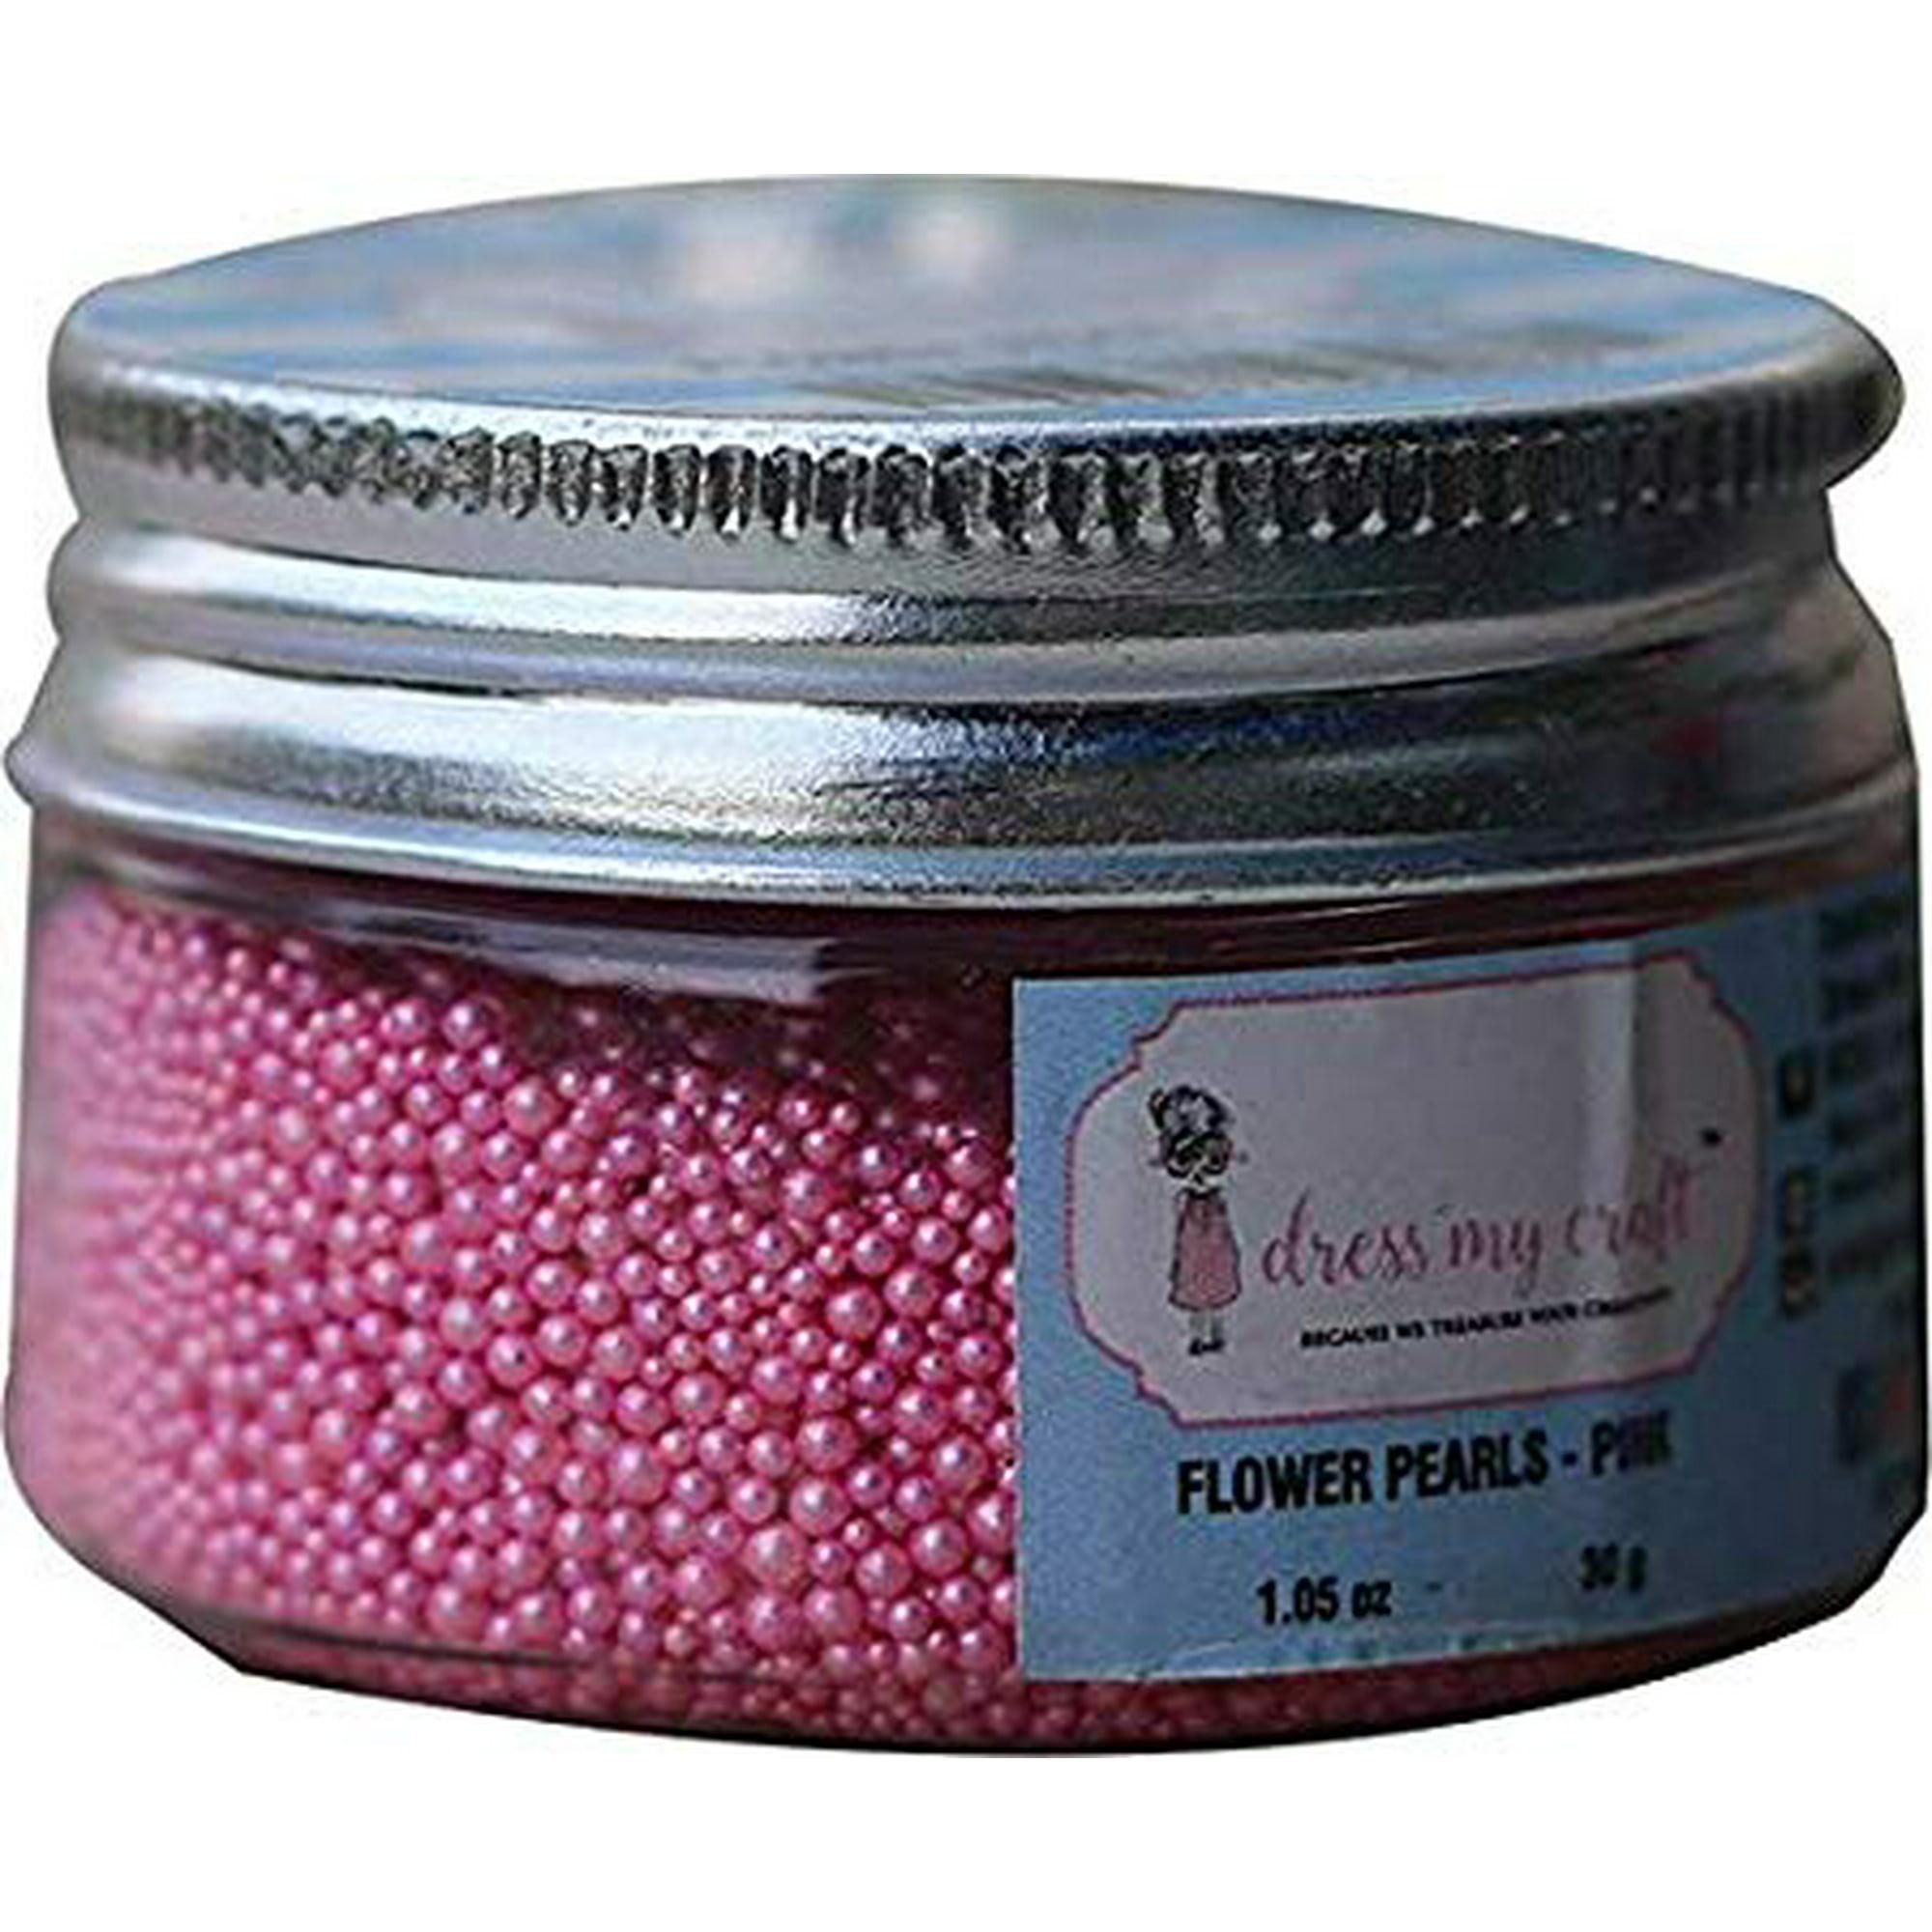 Dress My Craft Flower Pearls 1Oz-Pink | Walmart Canada